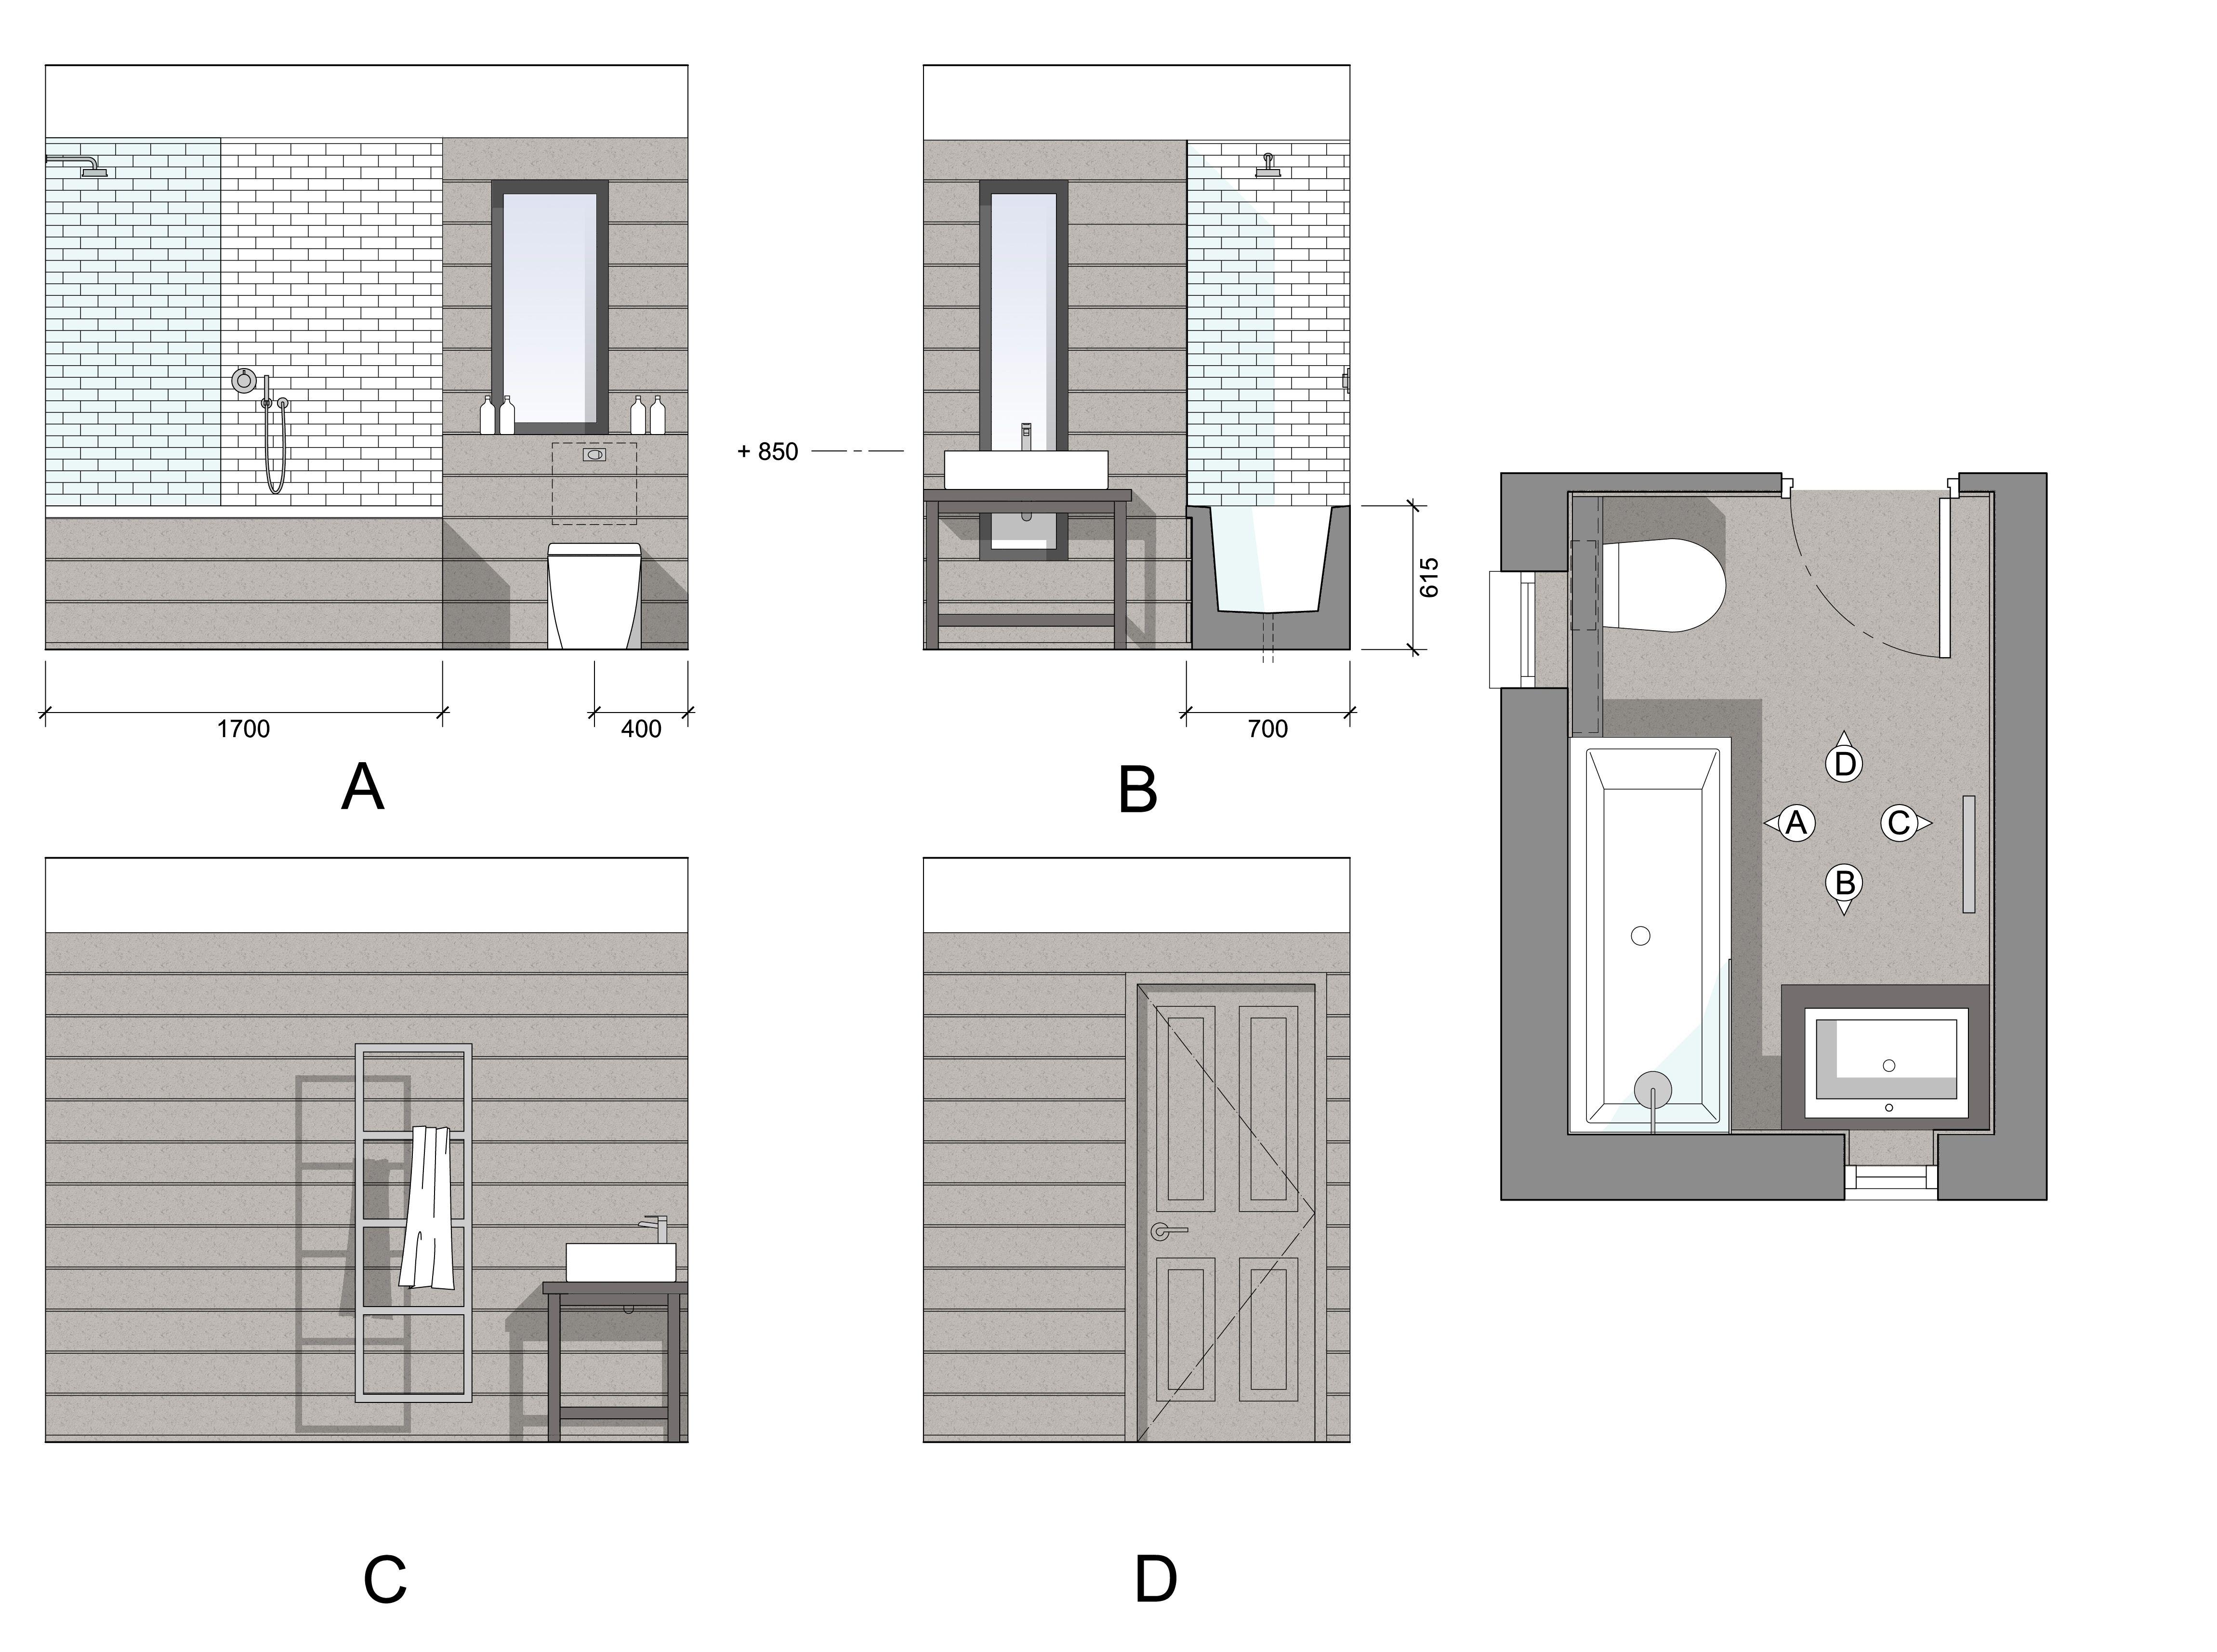 Front Elevation Of Bathroom : Bathroom elevations sample drawing infografías